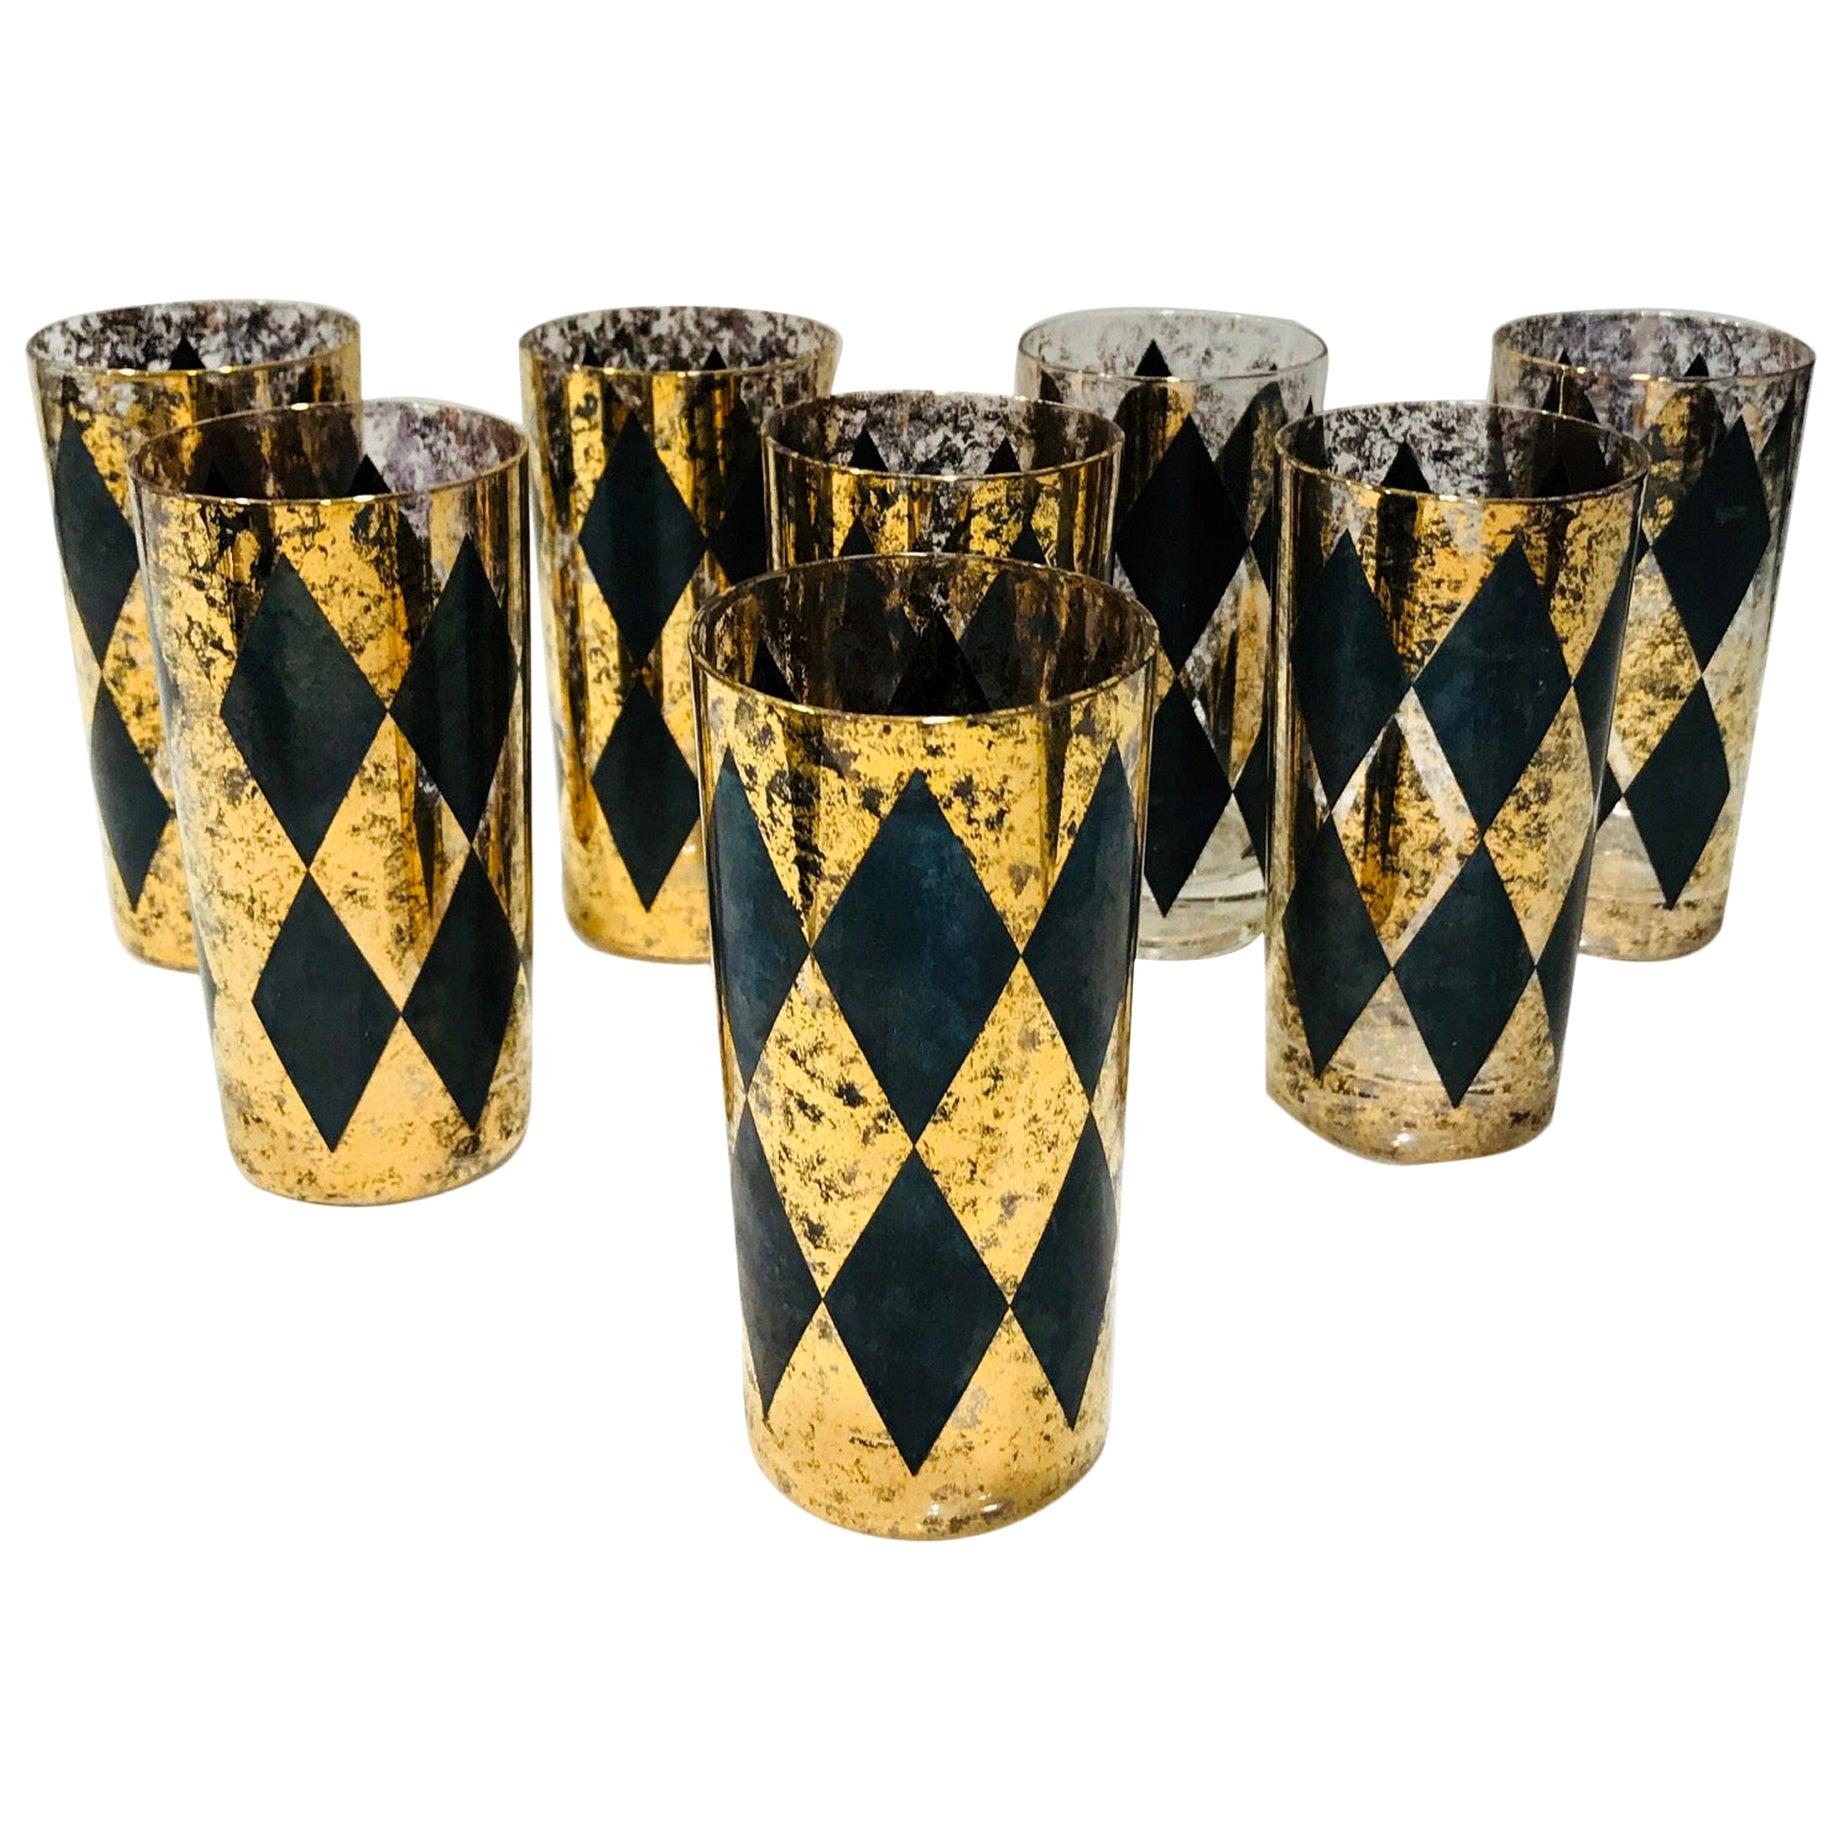 Set of Eight Hollywood Regency Tom Collins Barware Glasses in Gold & Black, 1960